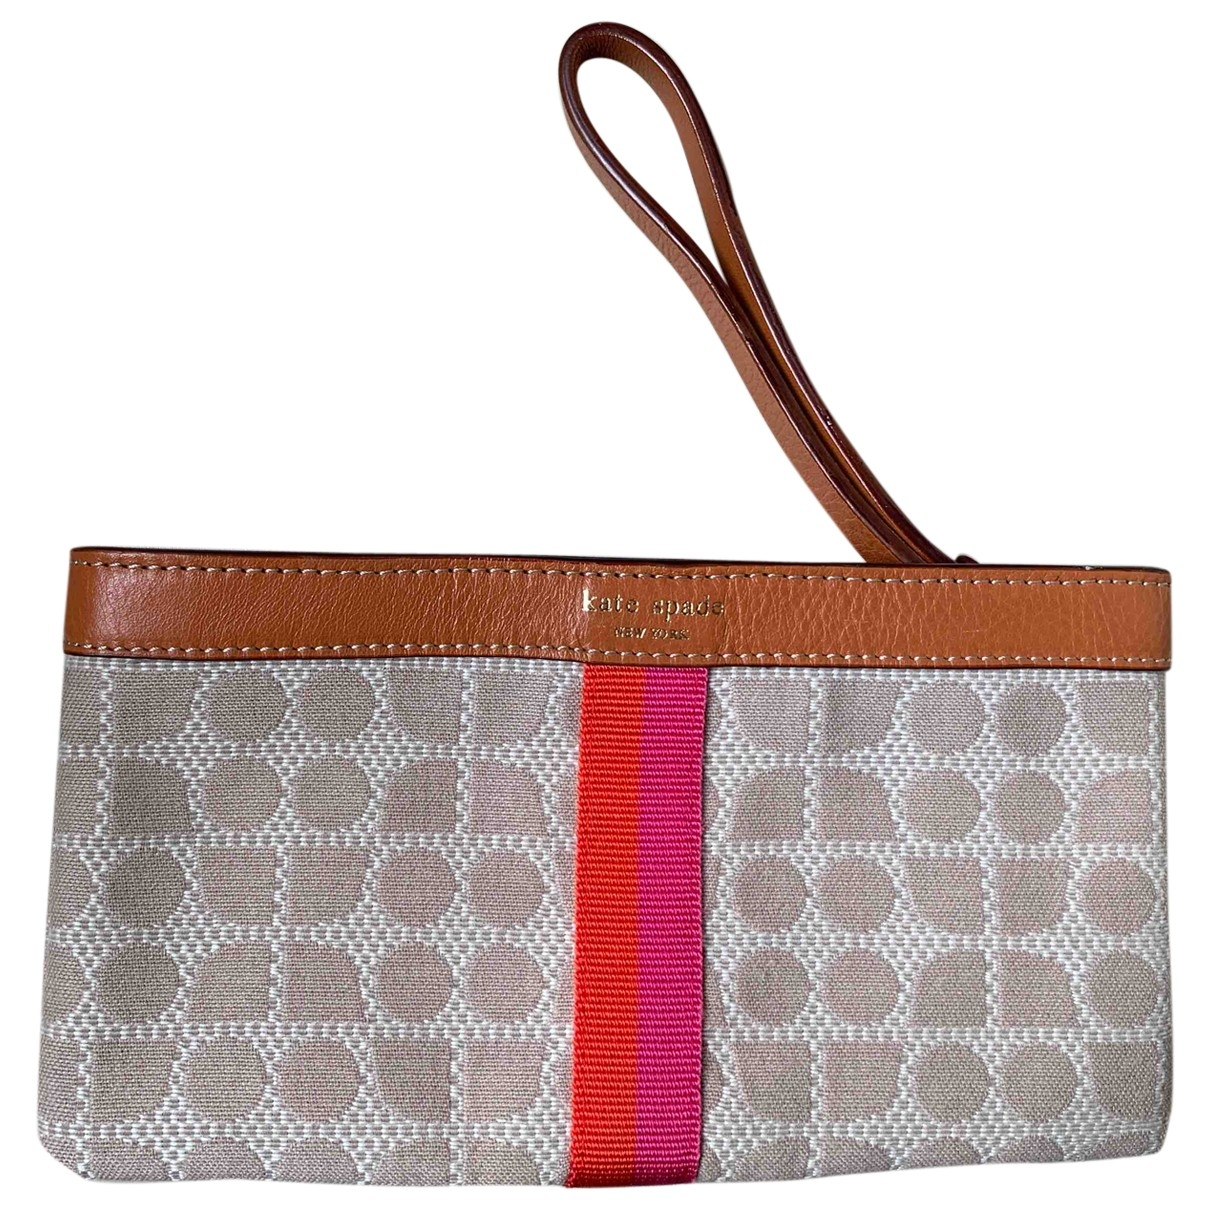 Kate Spade \N Brown Cloth Clutch bag for Women \N